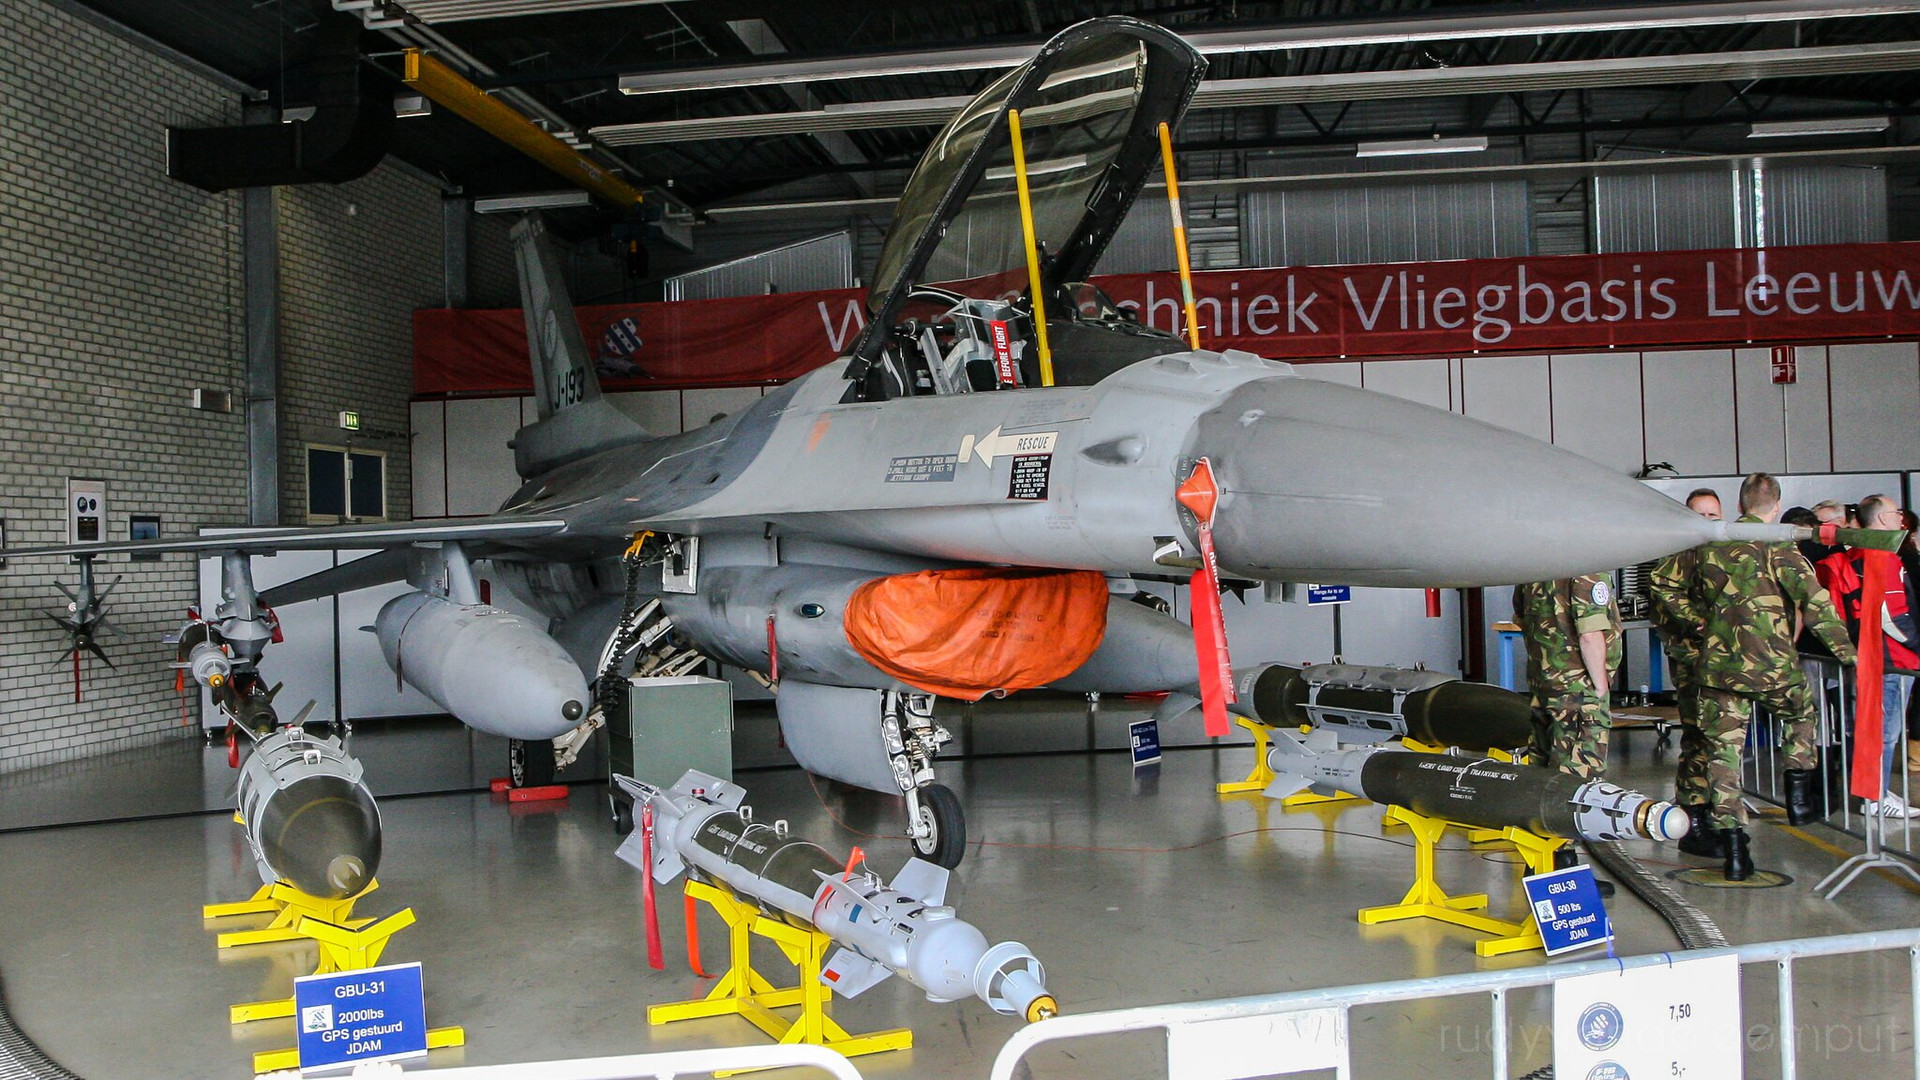 J-193   Build: 1985 - Lockheed Martin F-16 A Fighting Falcon